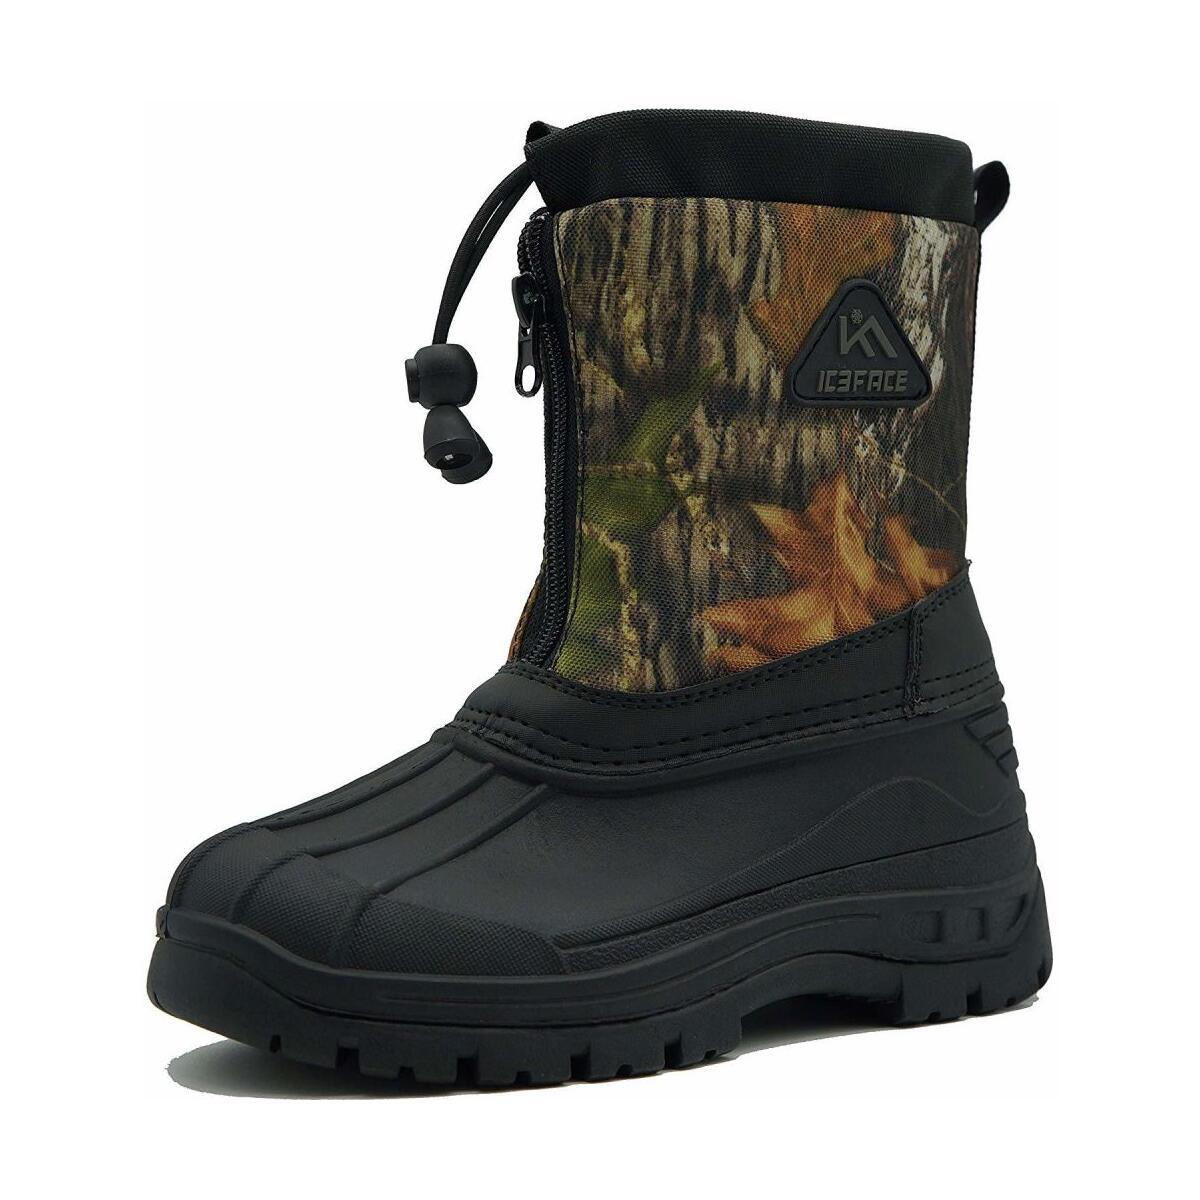 Kids - Waterproof - Winter Snow Boot